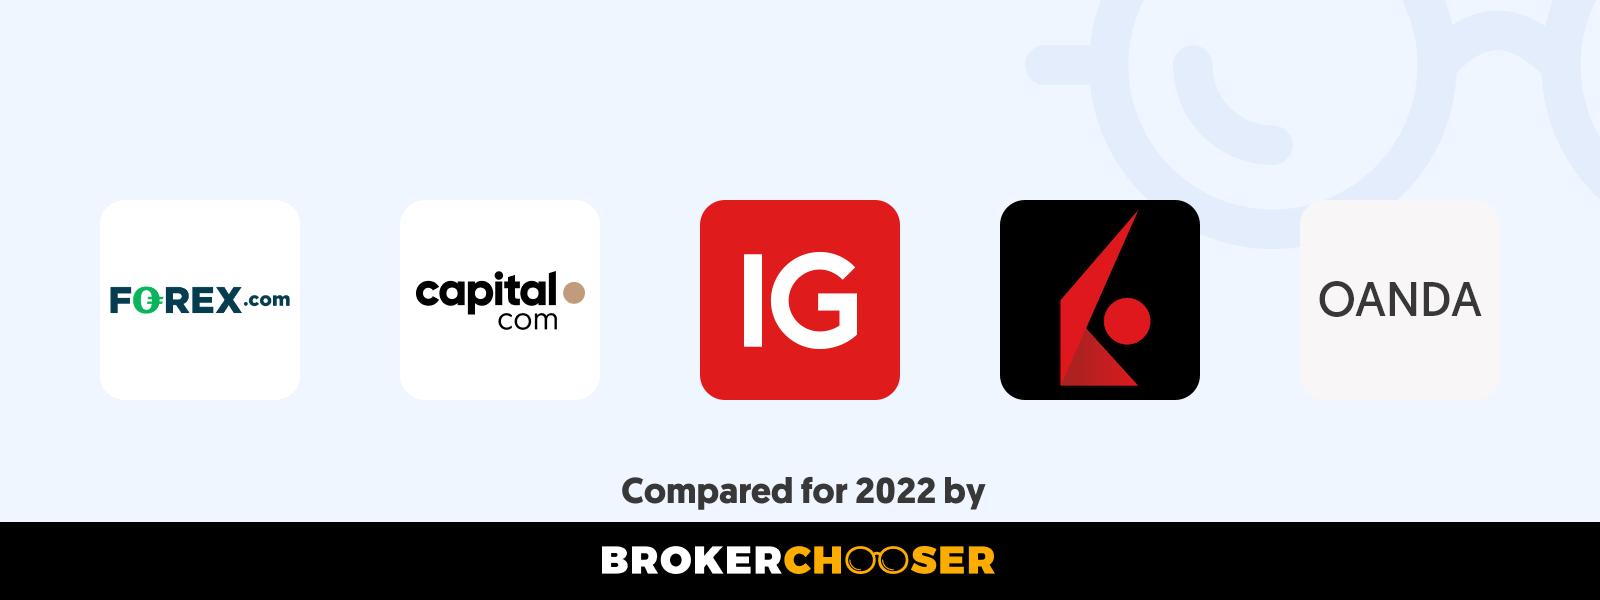 Best forex brokers for beginners in Guyana in 2021